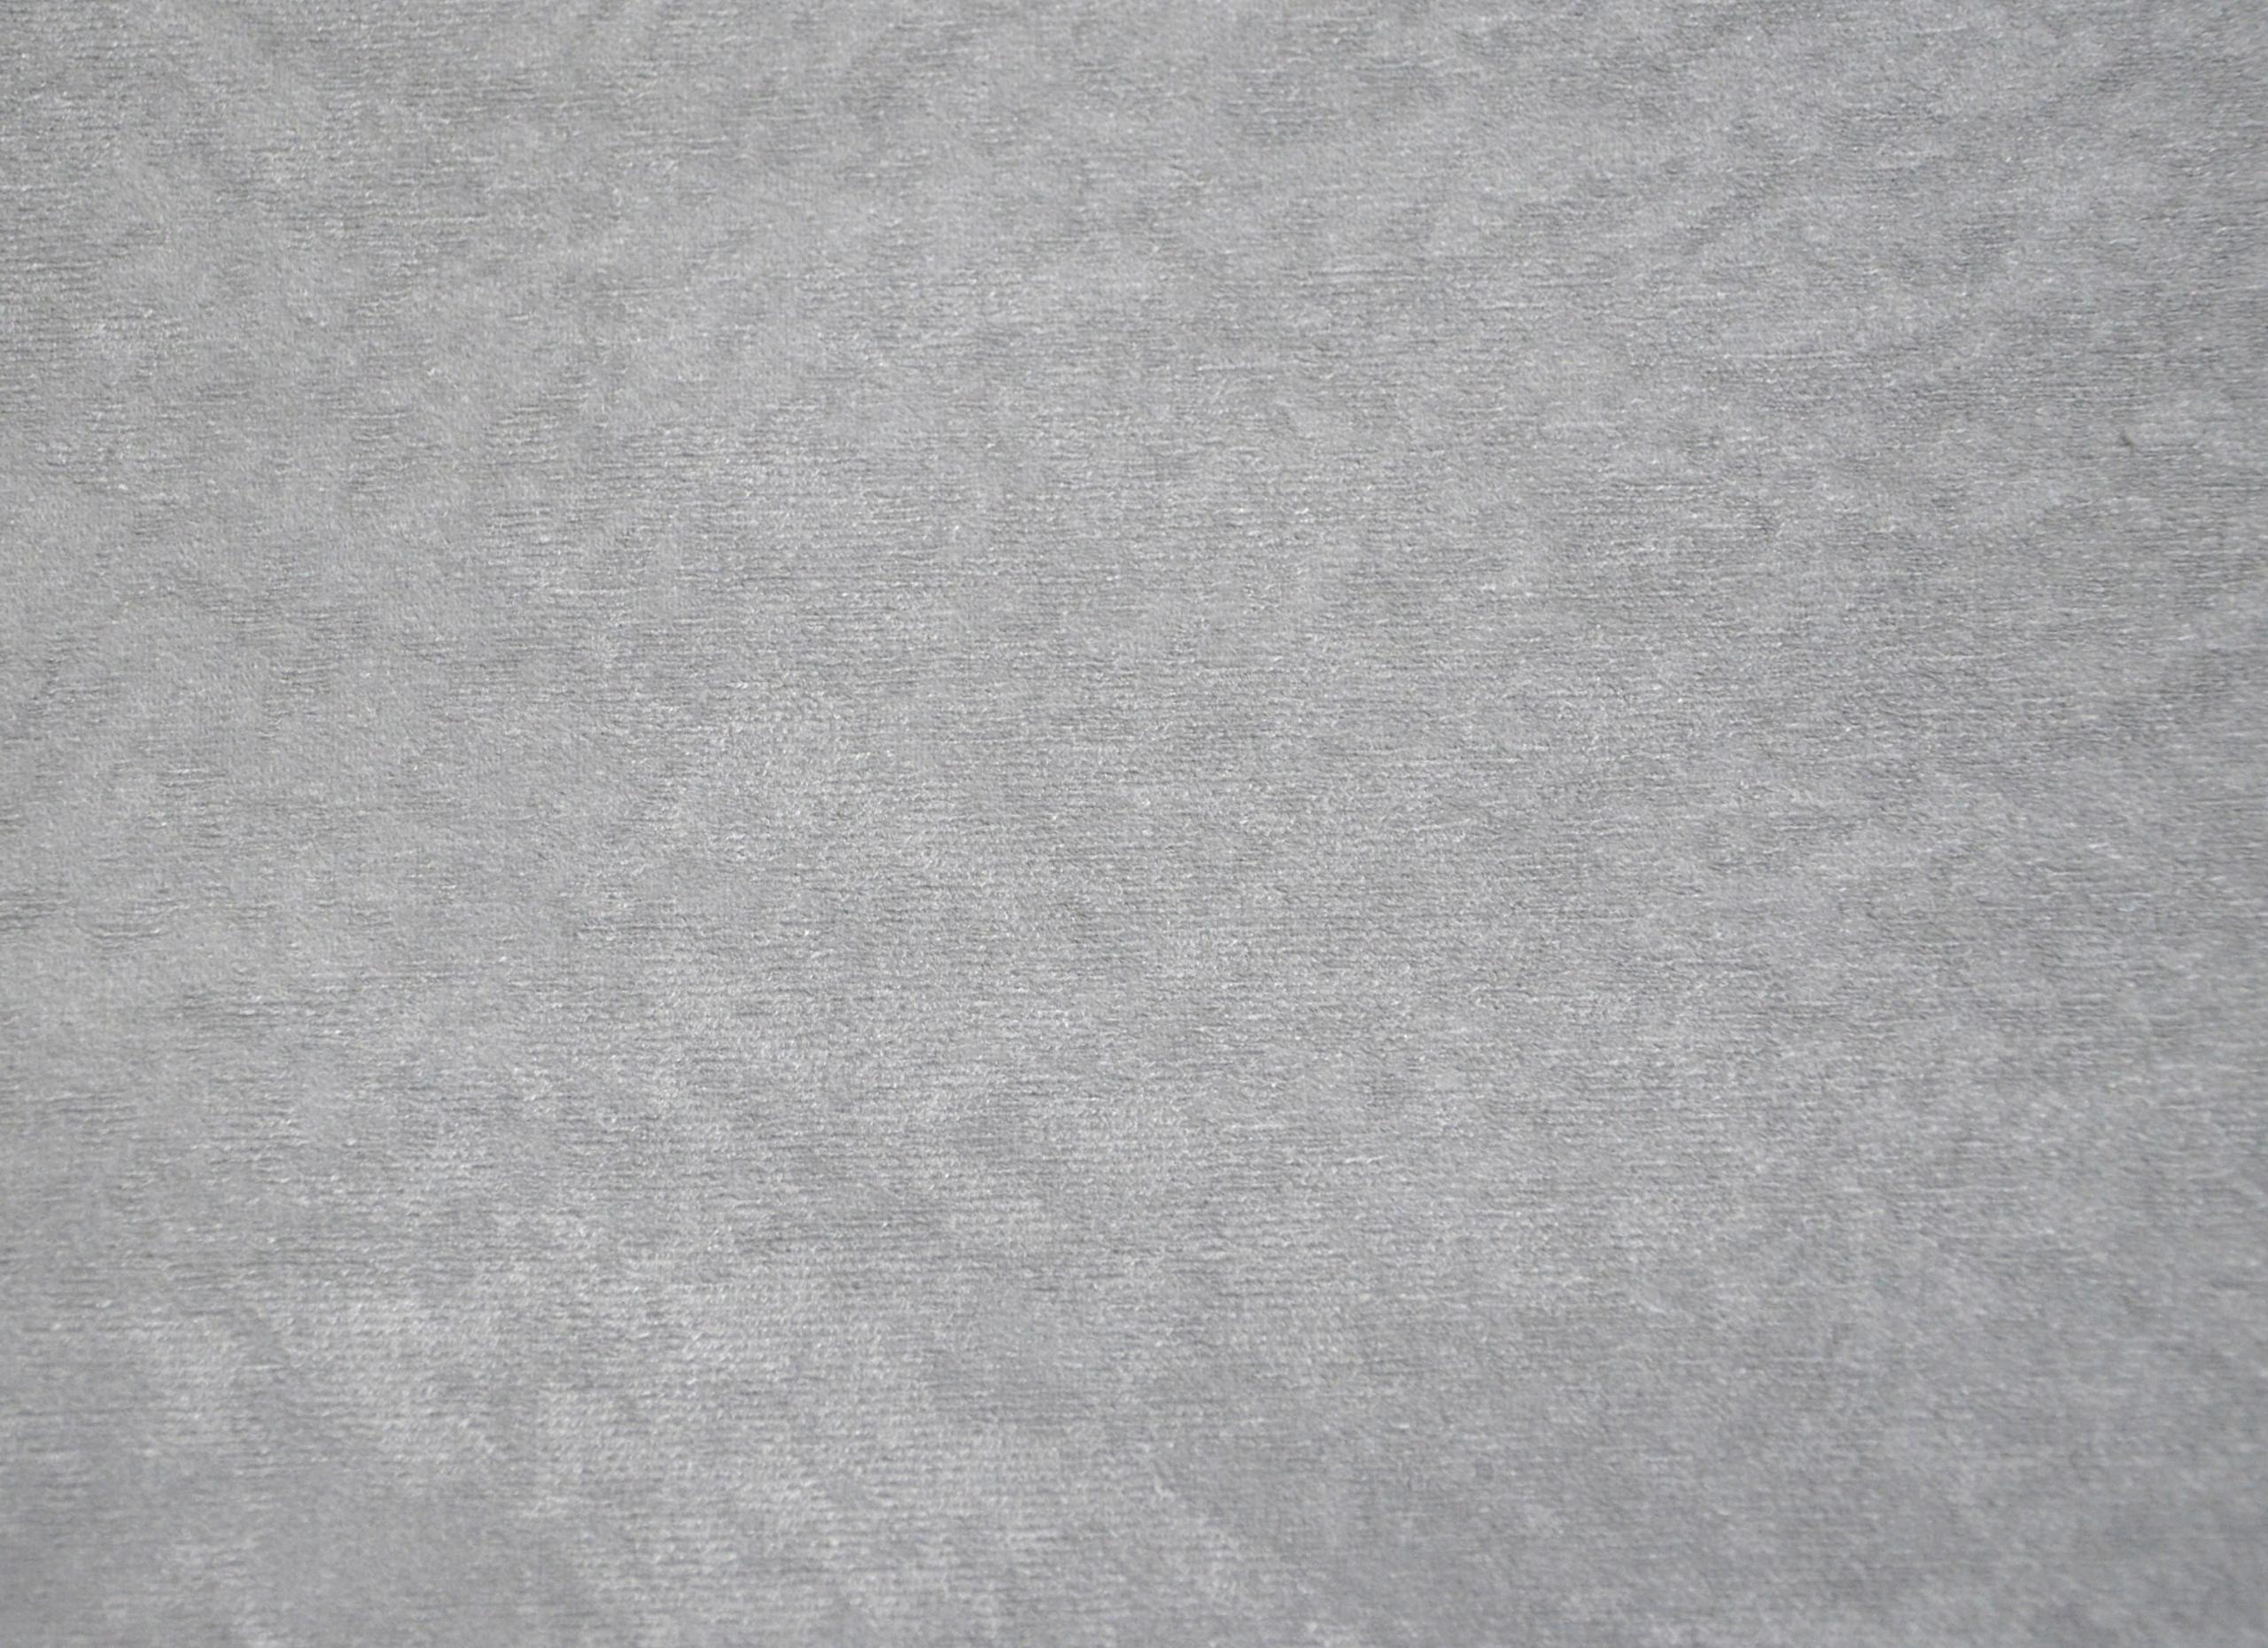 SAM01 Tkanina samochodowa na podsufitkę tapicerka